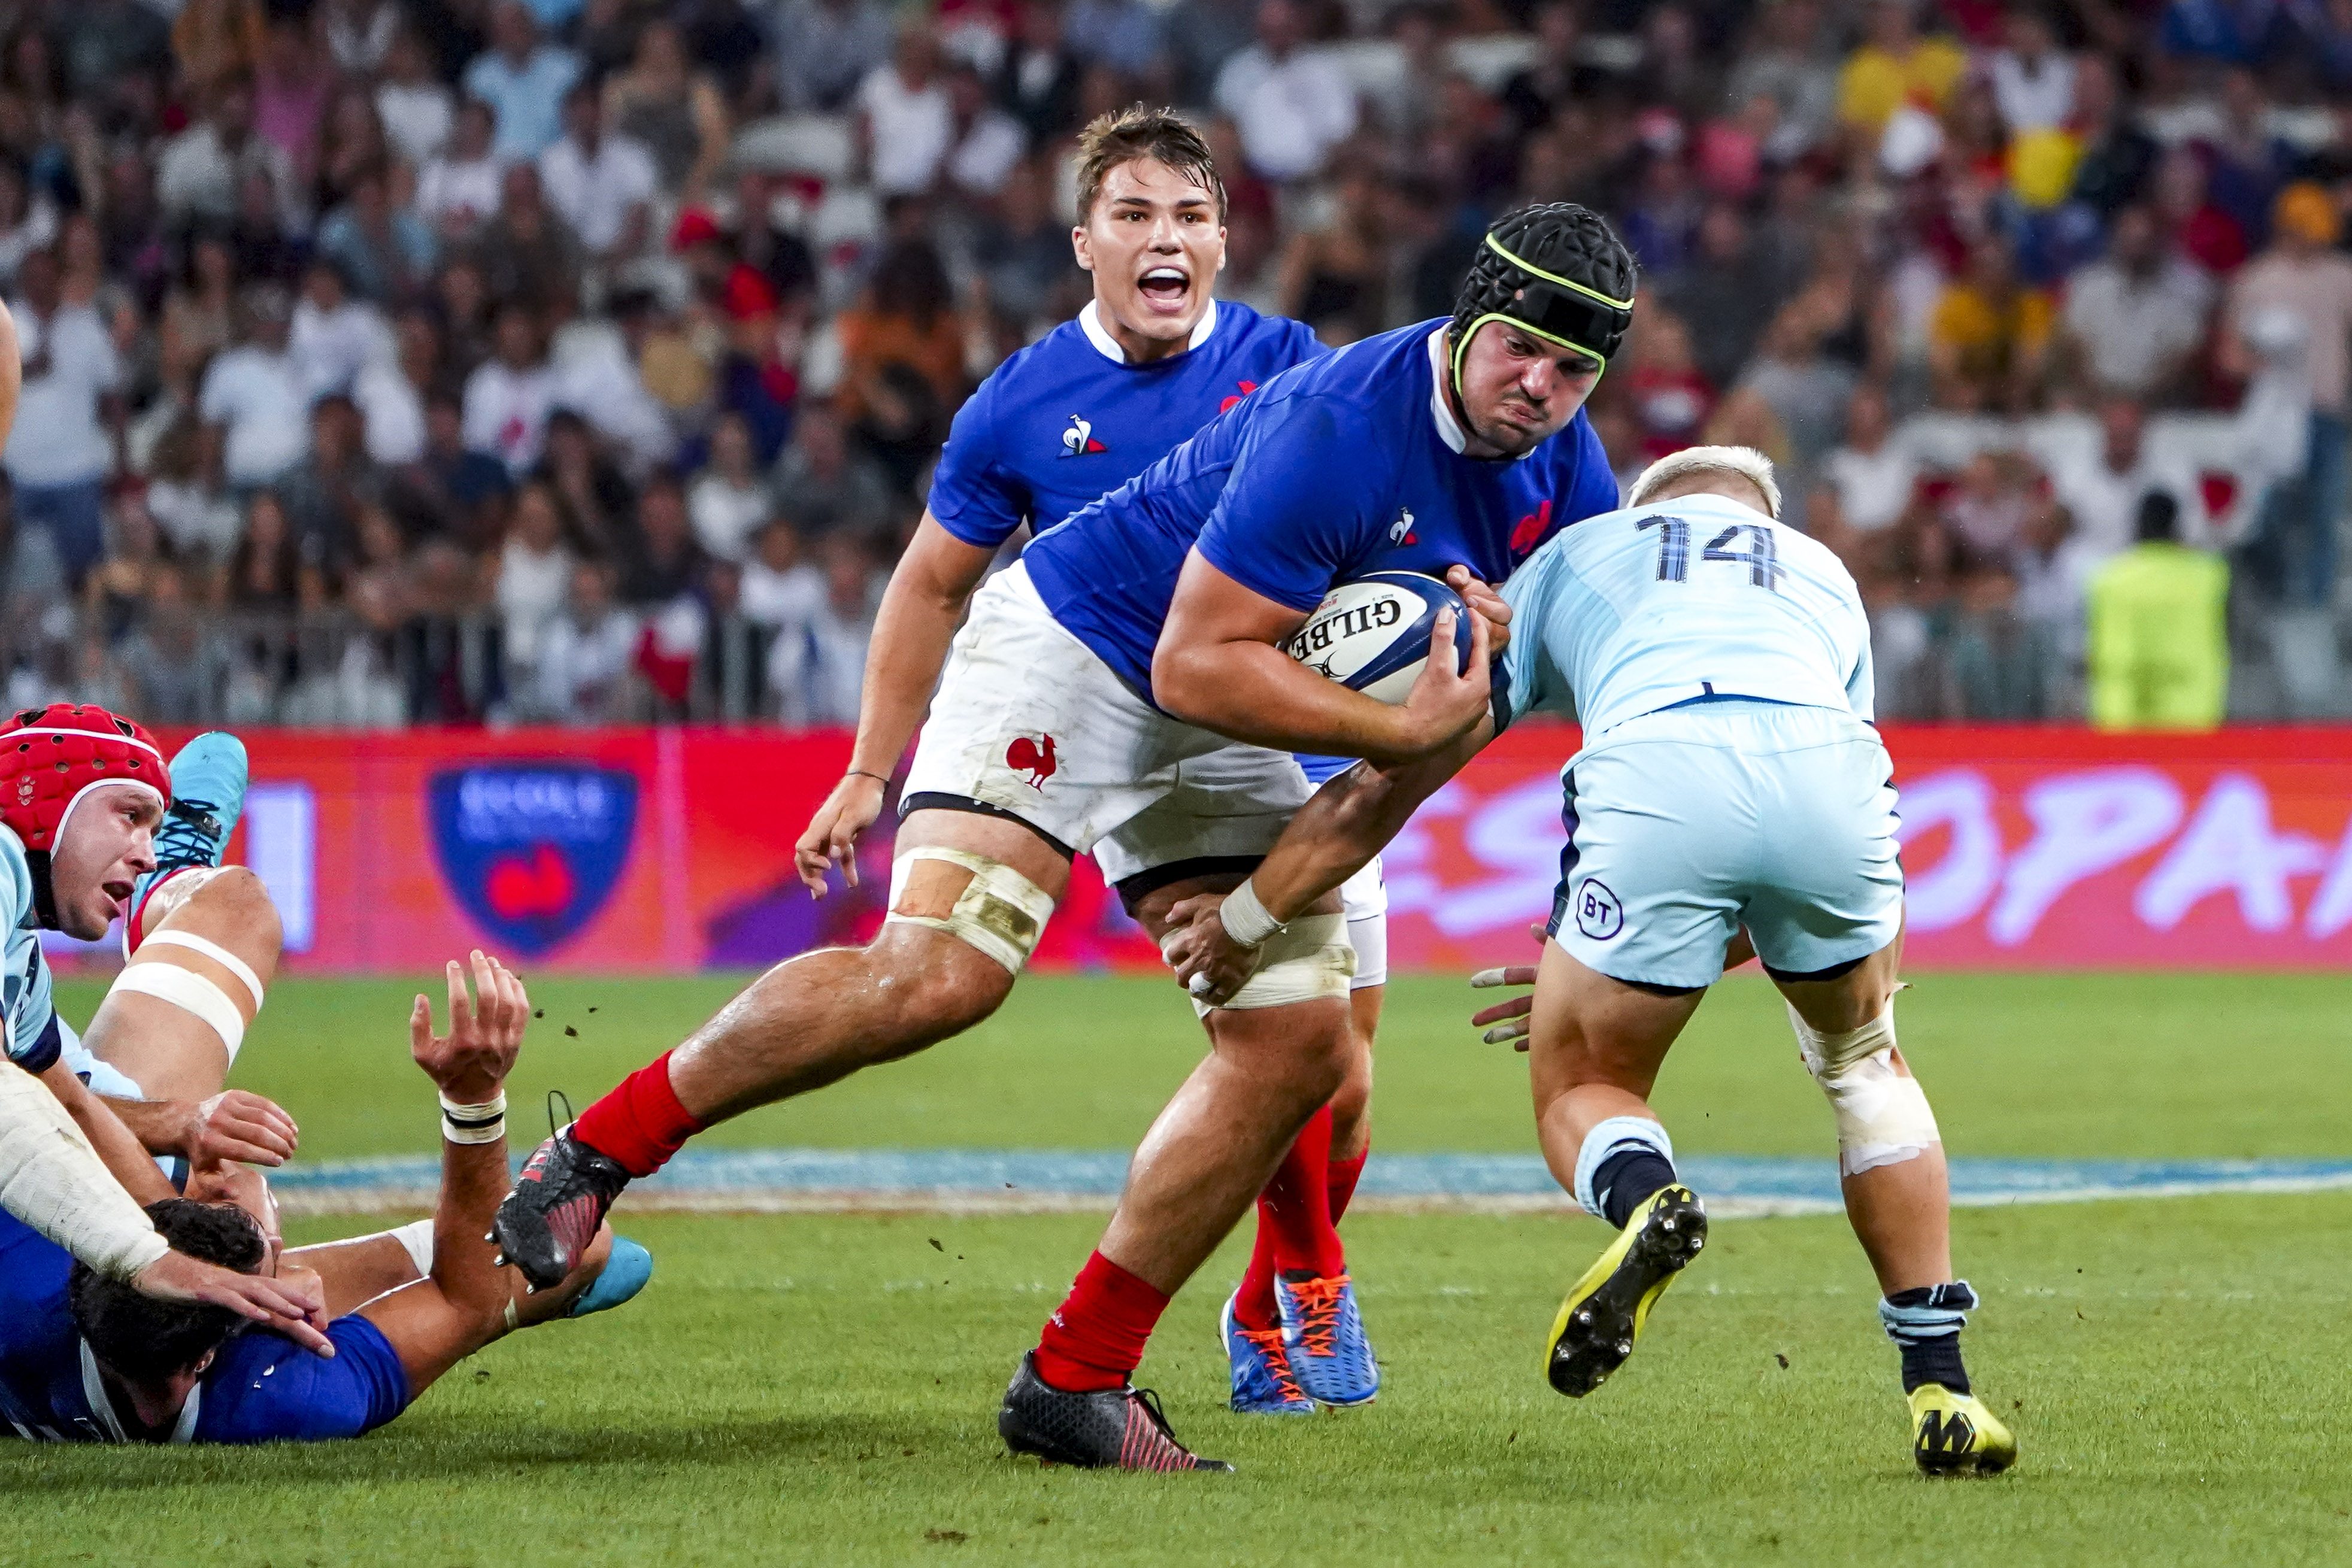 Rugby - Coupe du monde 2019 - XV de France: Grégory Alldritt, l'ascension express